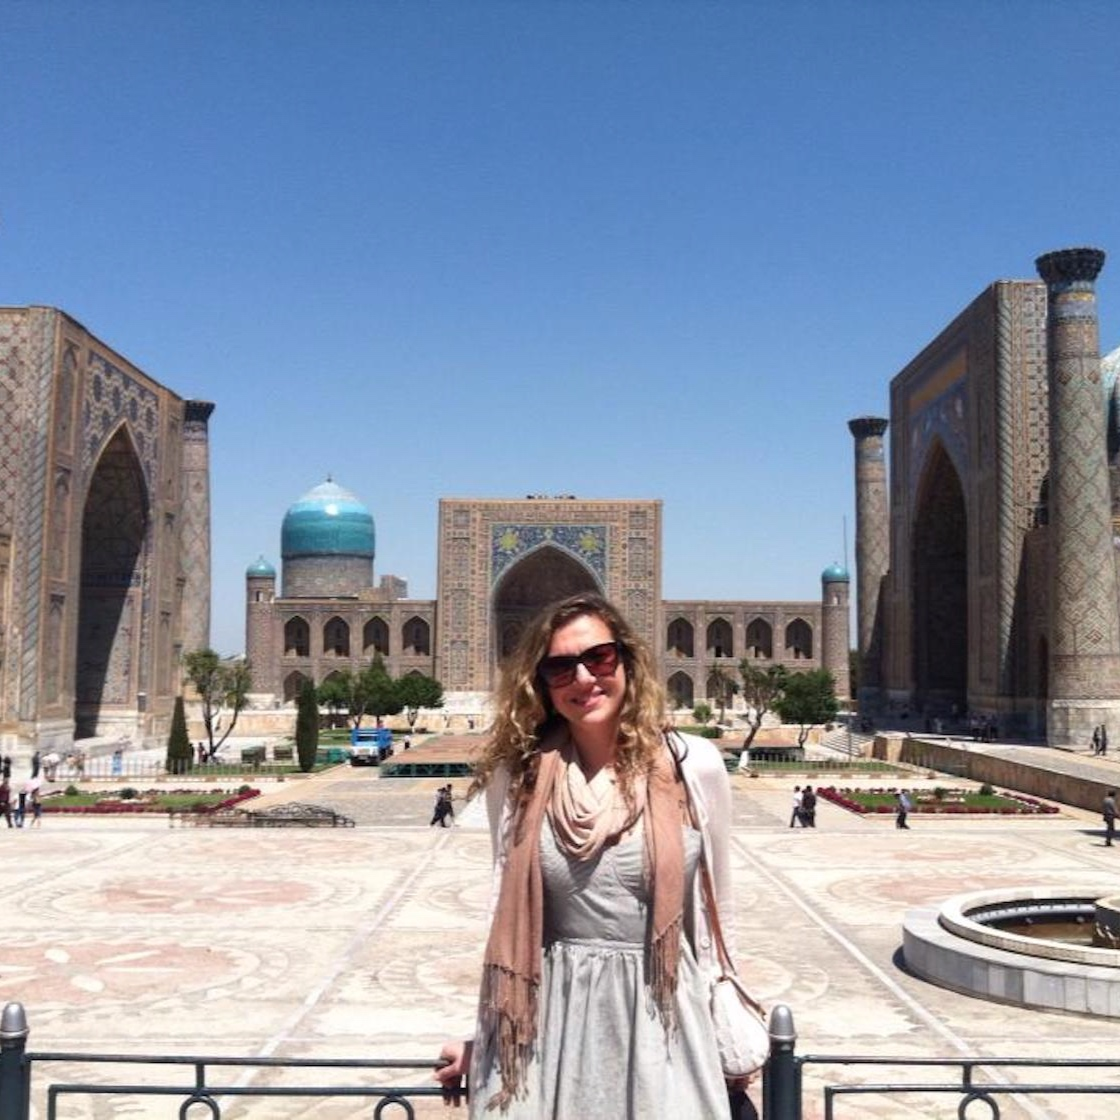 erin-levi-registan-samarkand-uzbekistan-jpg.jpg